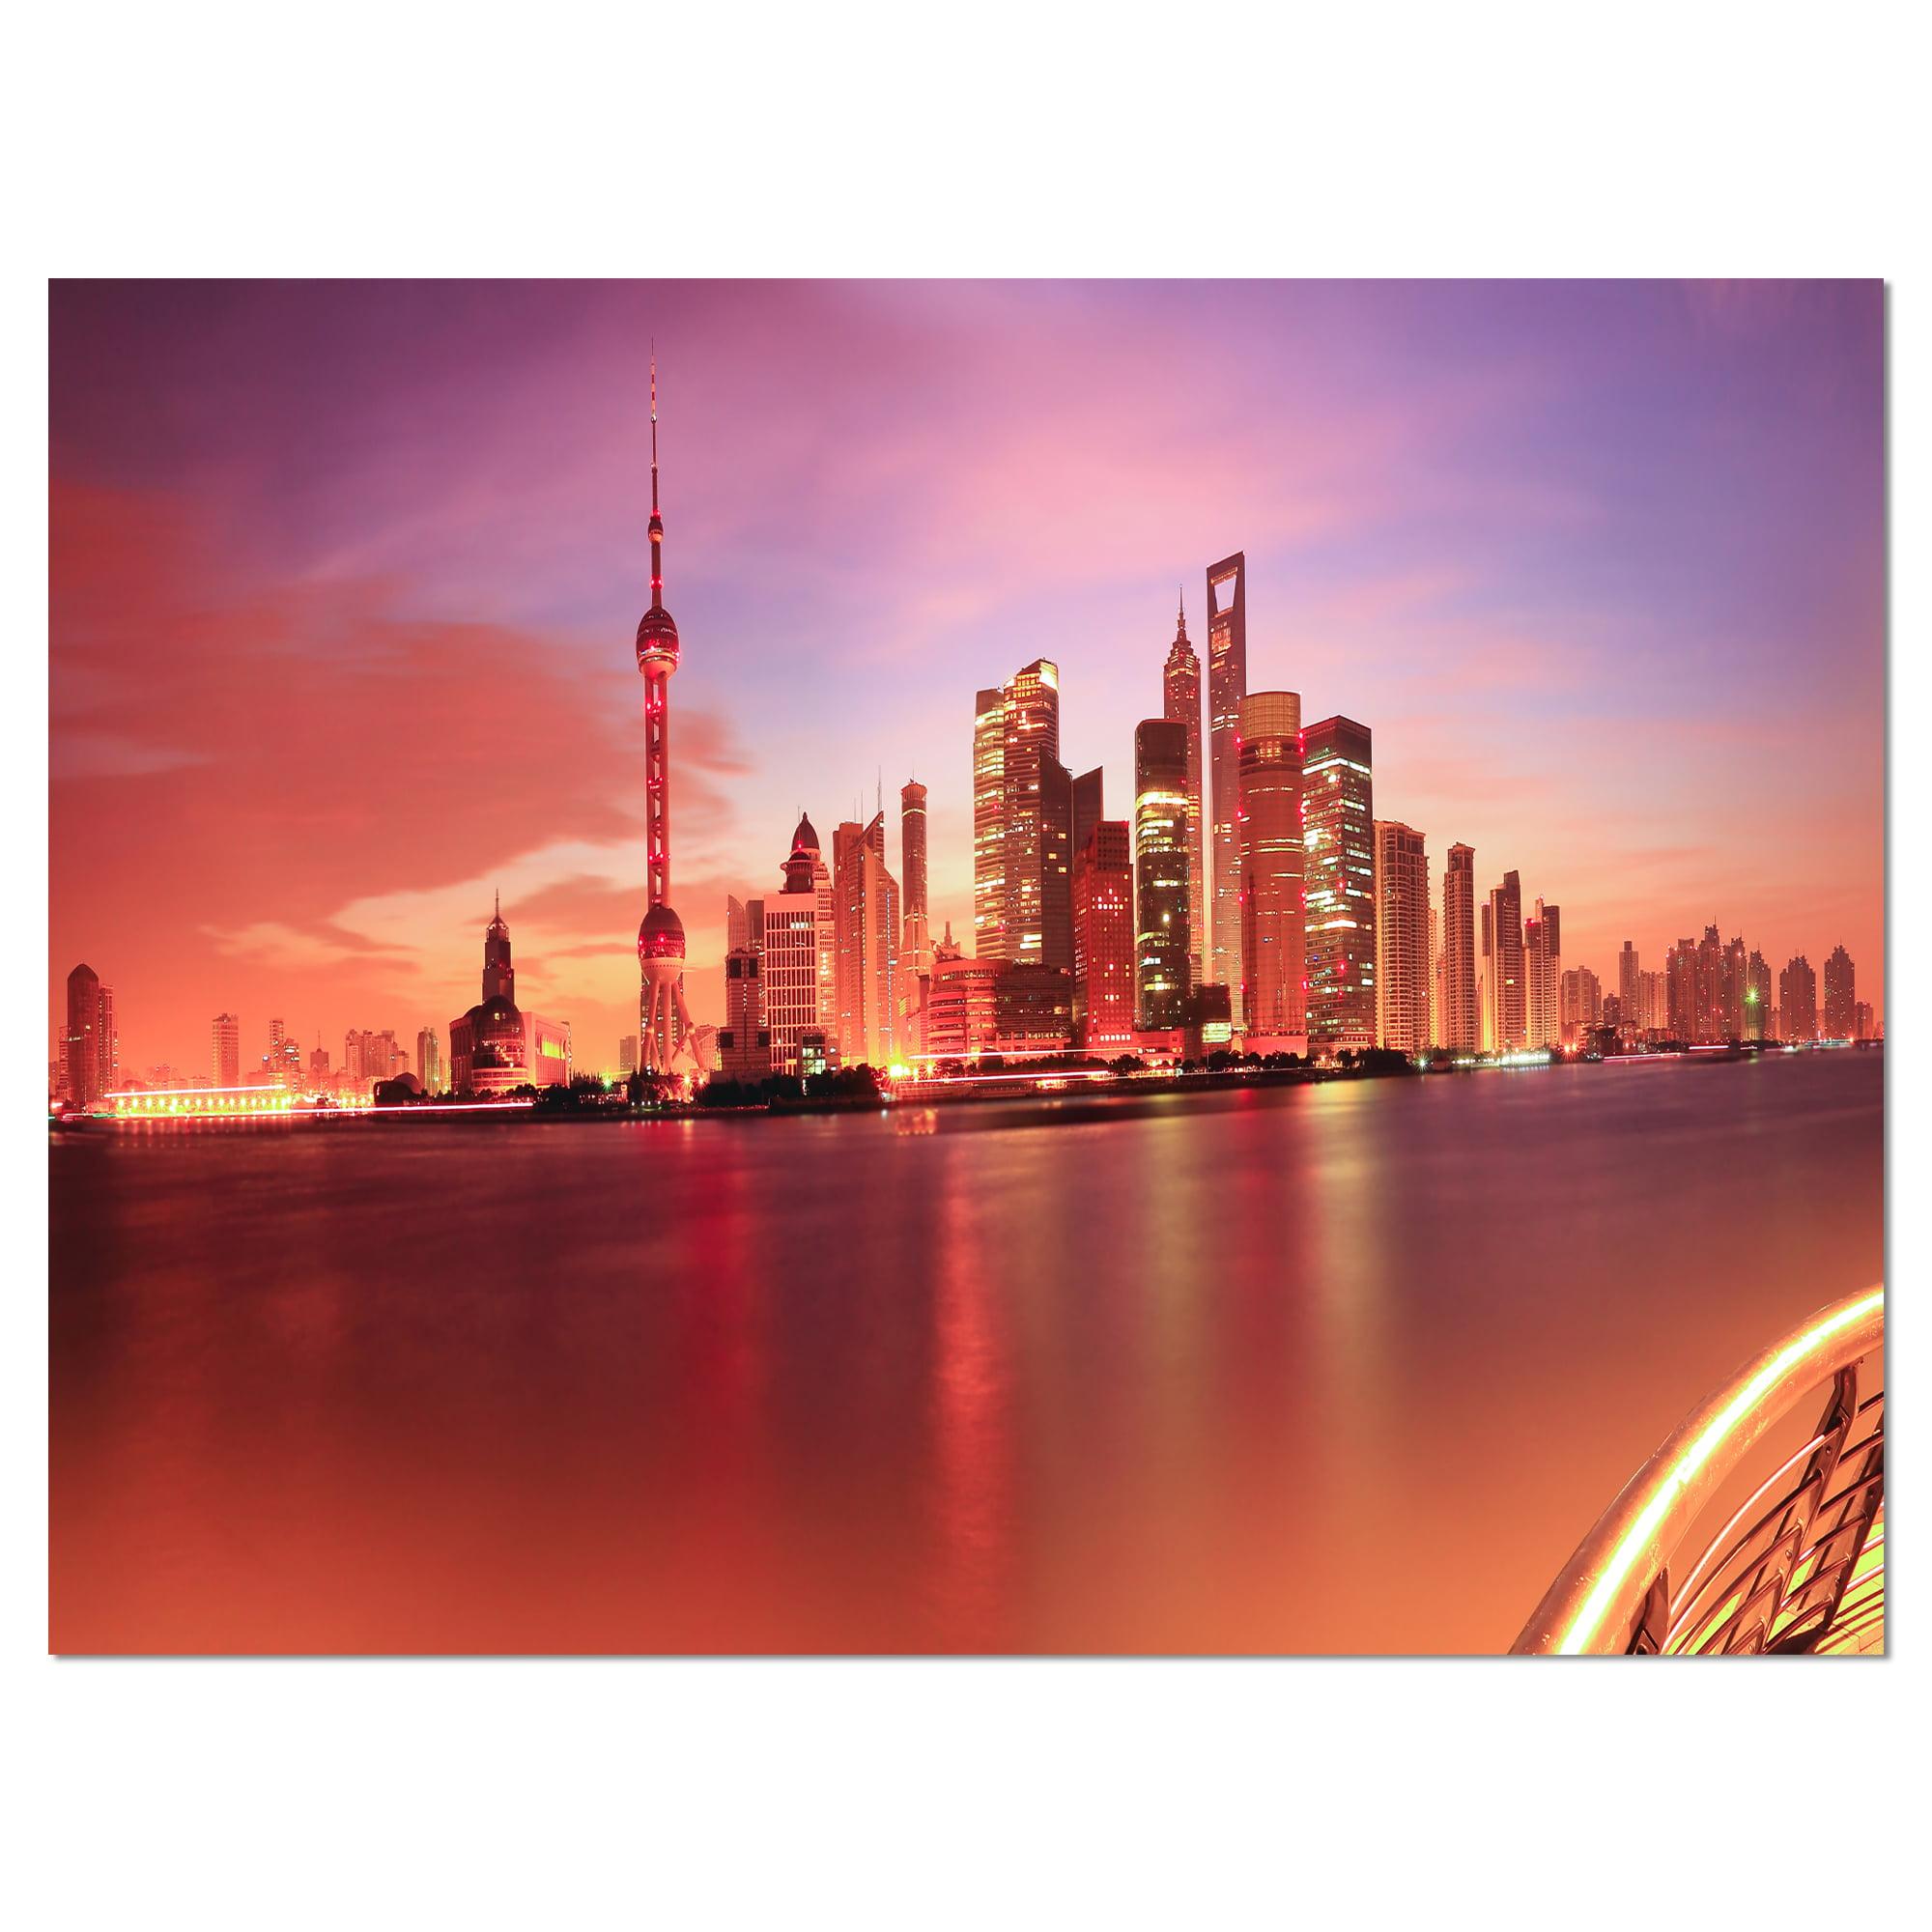 Shanghai Skyline at Dawn Panorama - image 2 de 3